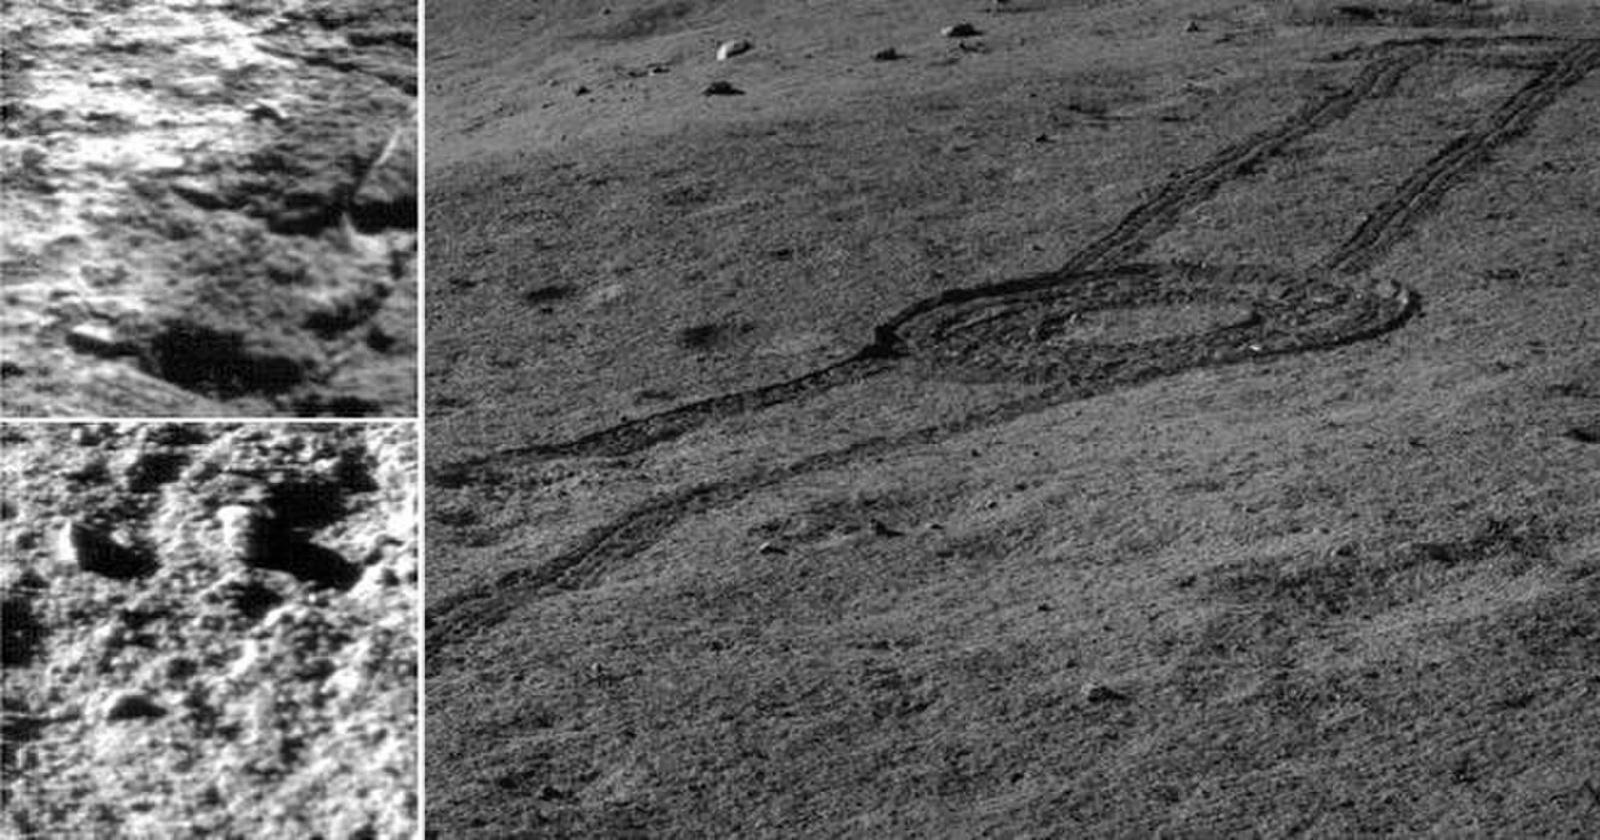 Китайский луноход обнаружил минералы из мантии Луны